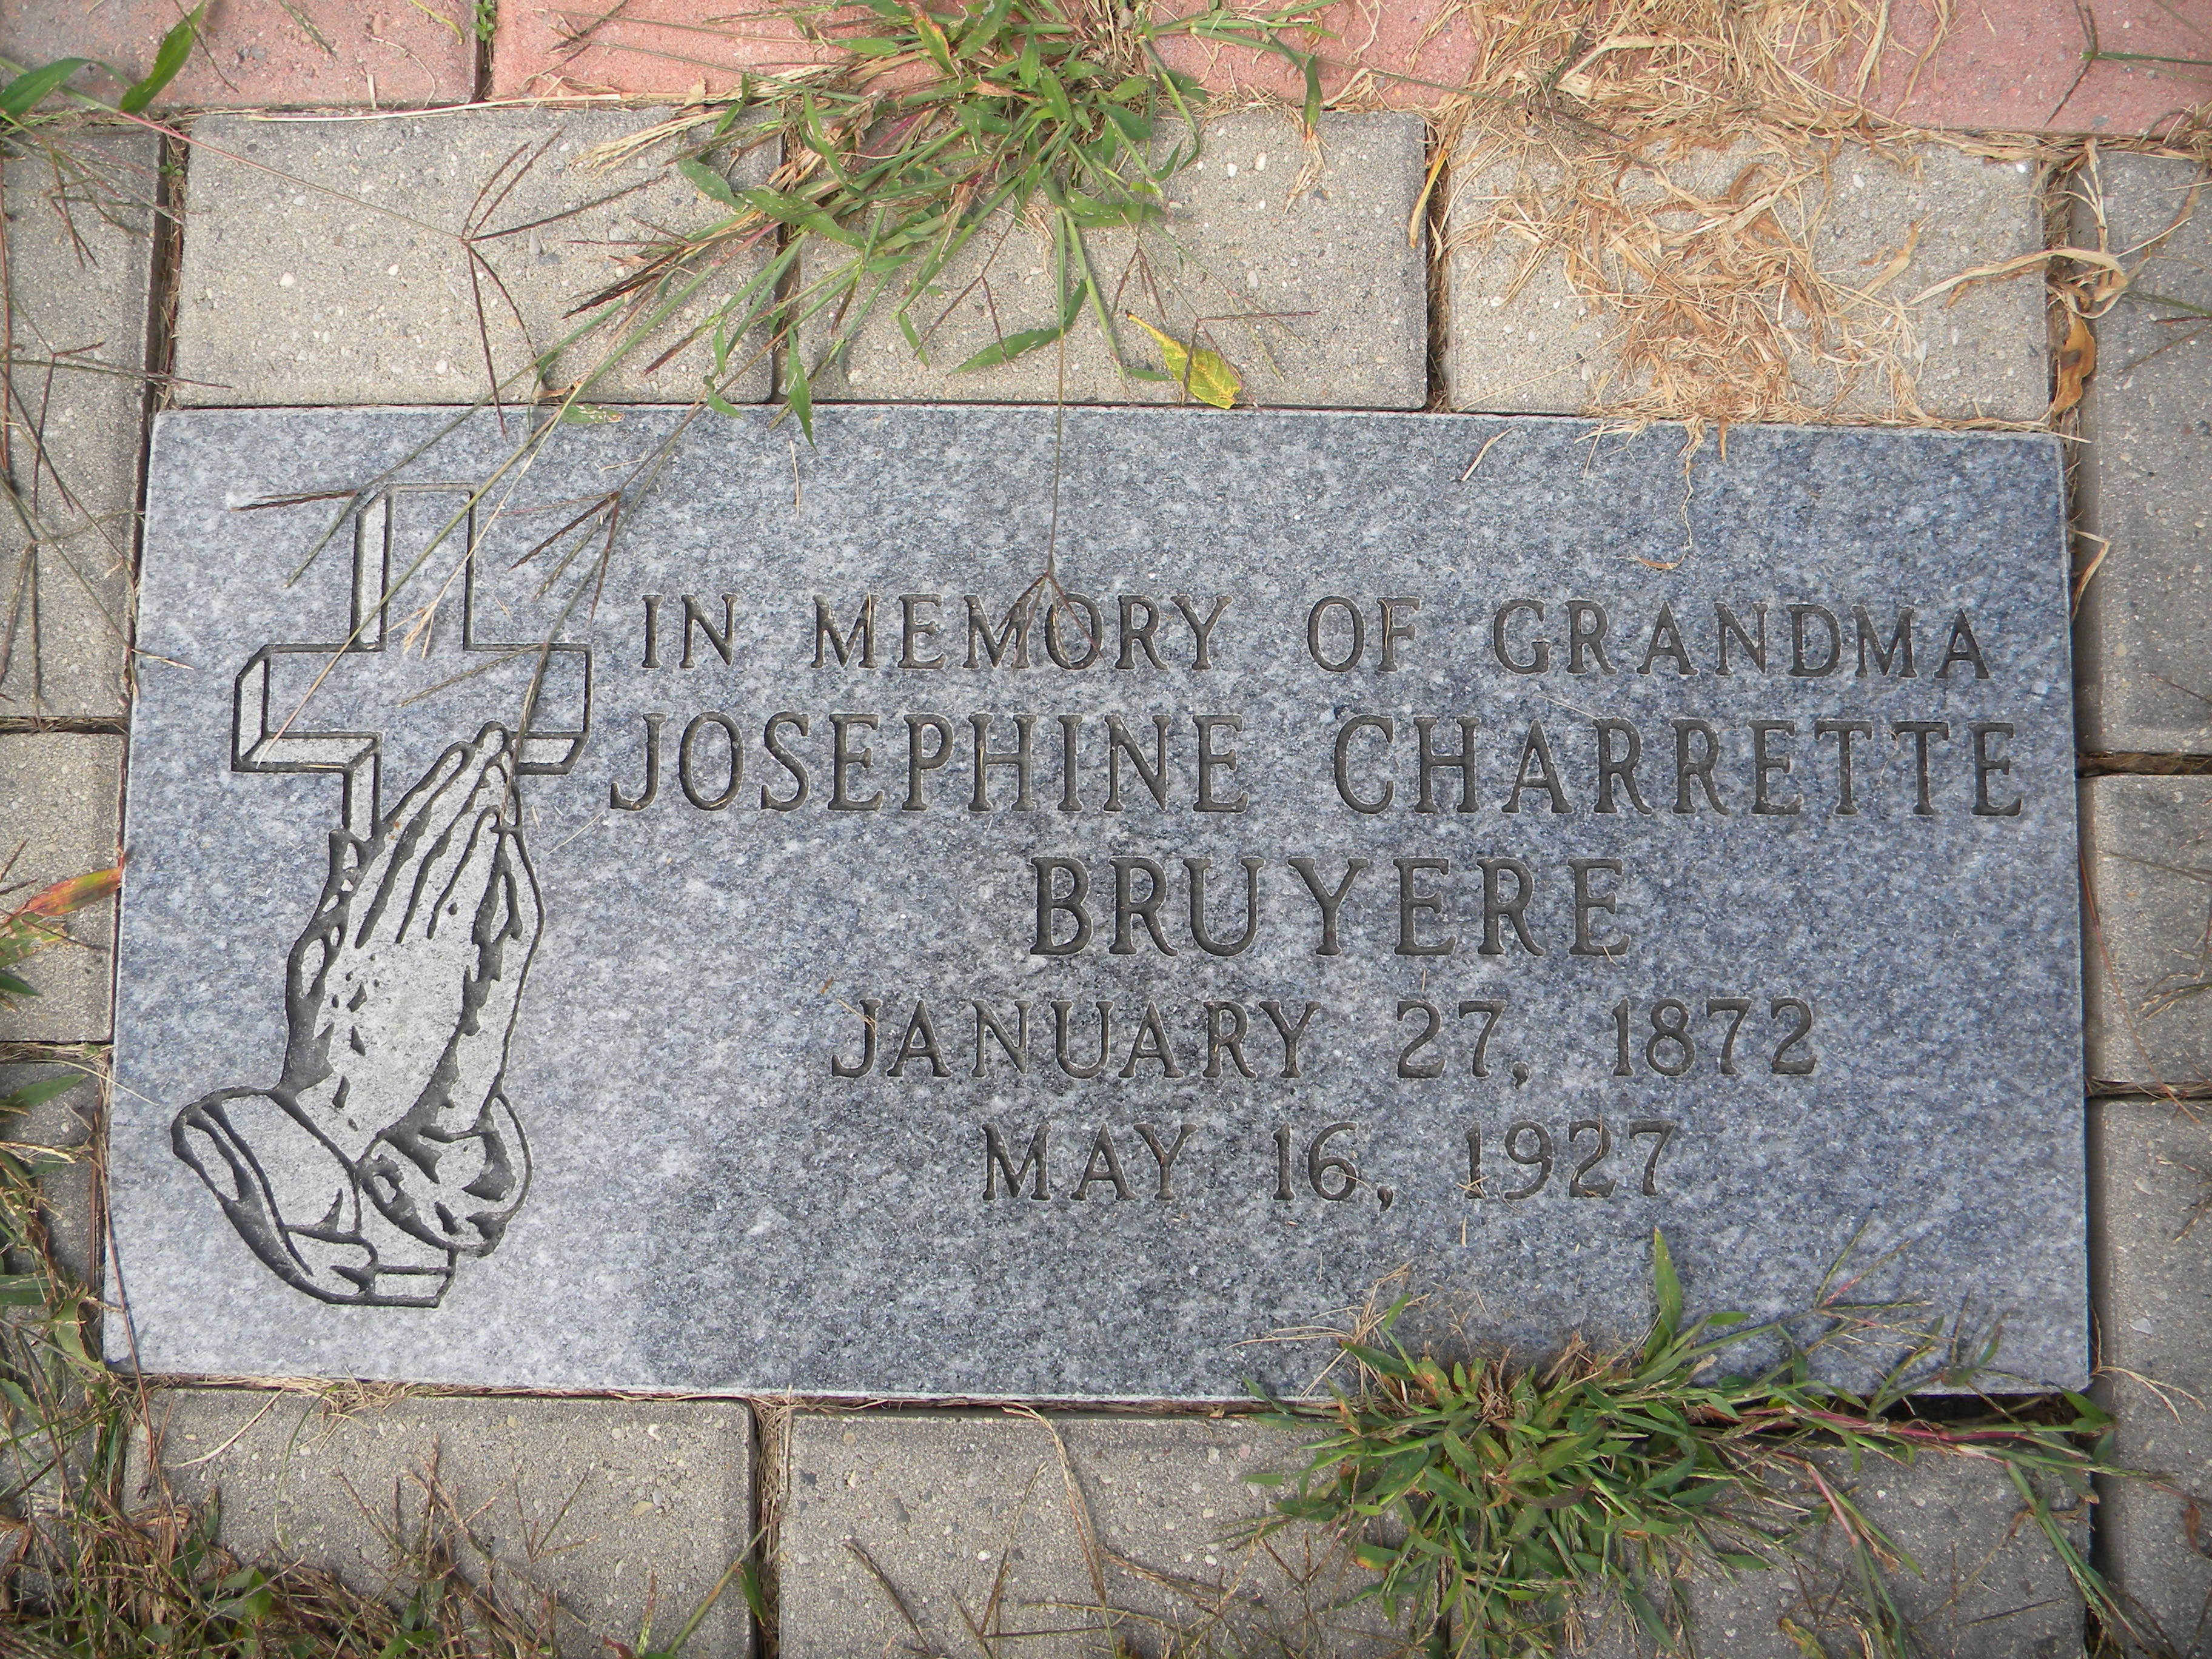 Josephine <i>Charrette</i> Bruyere